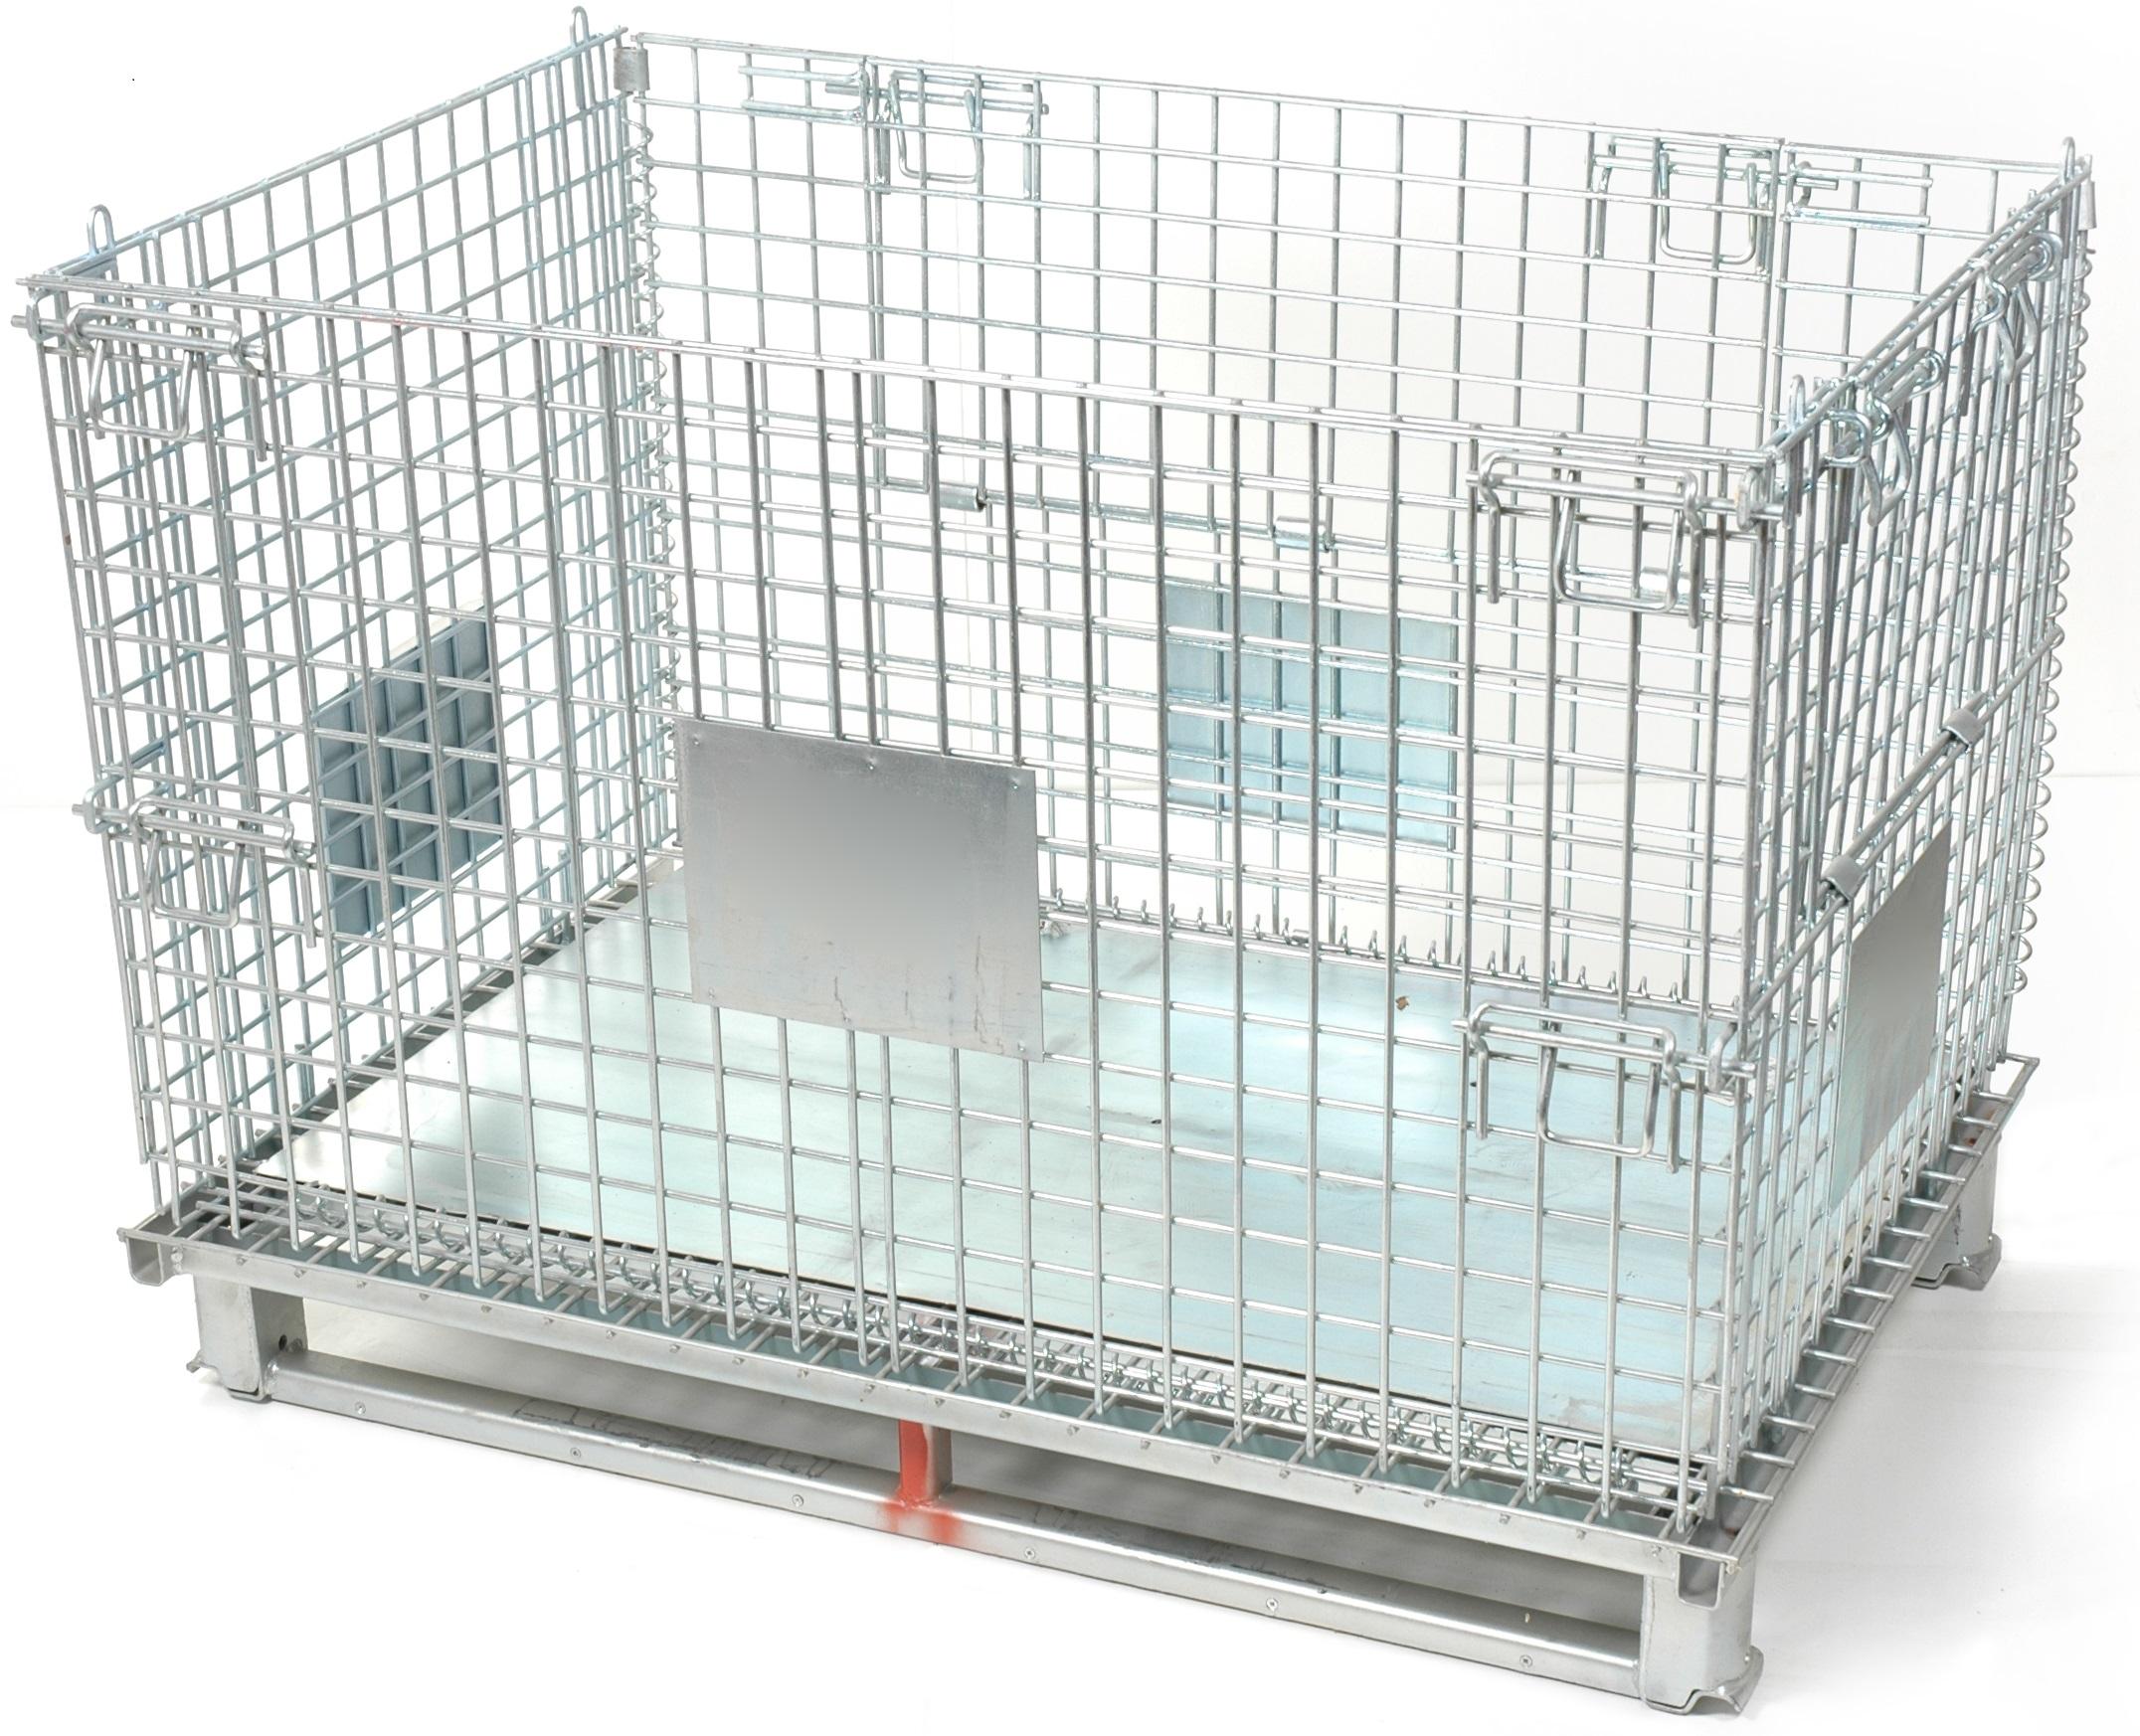 Gaasbox Gitterbox 120x80x85cm